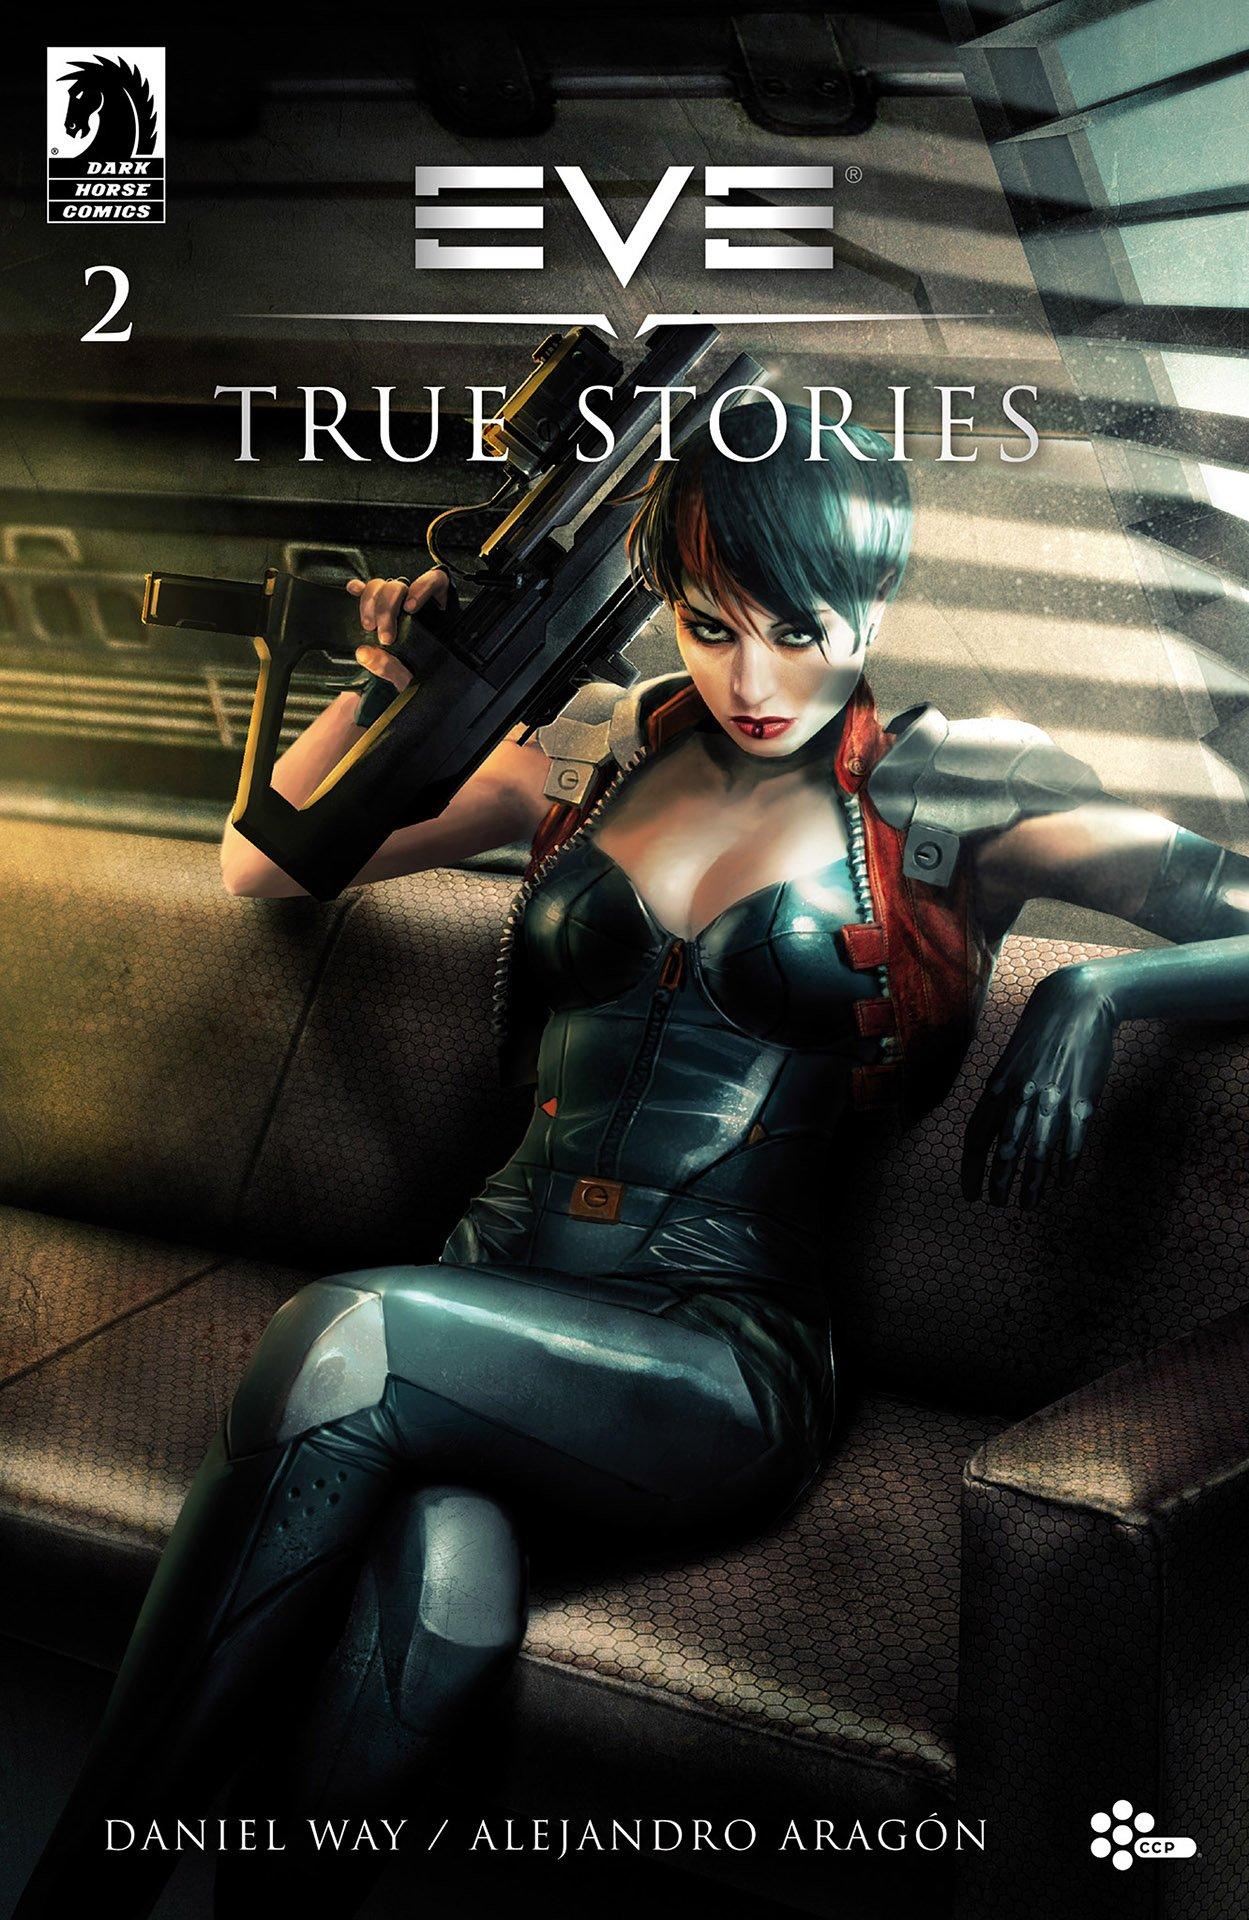 EVE - True Stories 002 (February 2014)